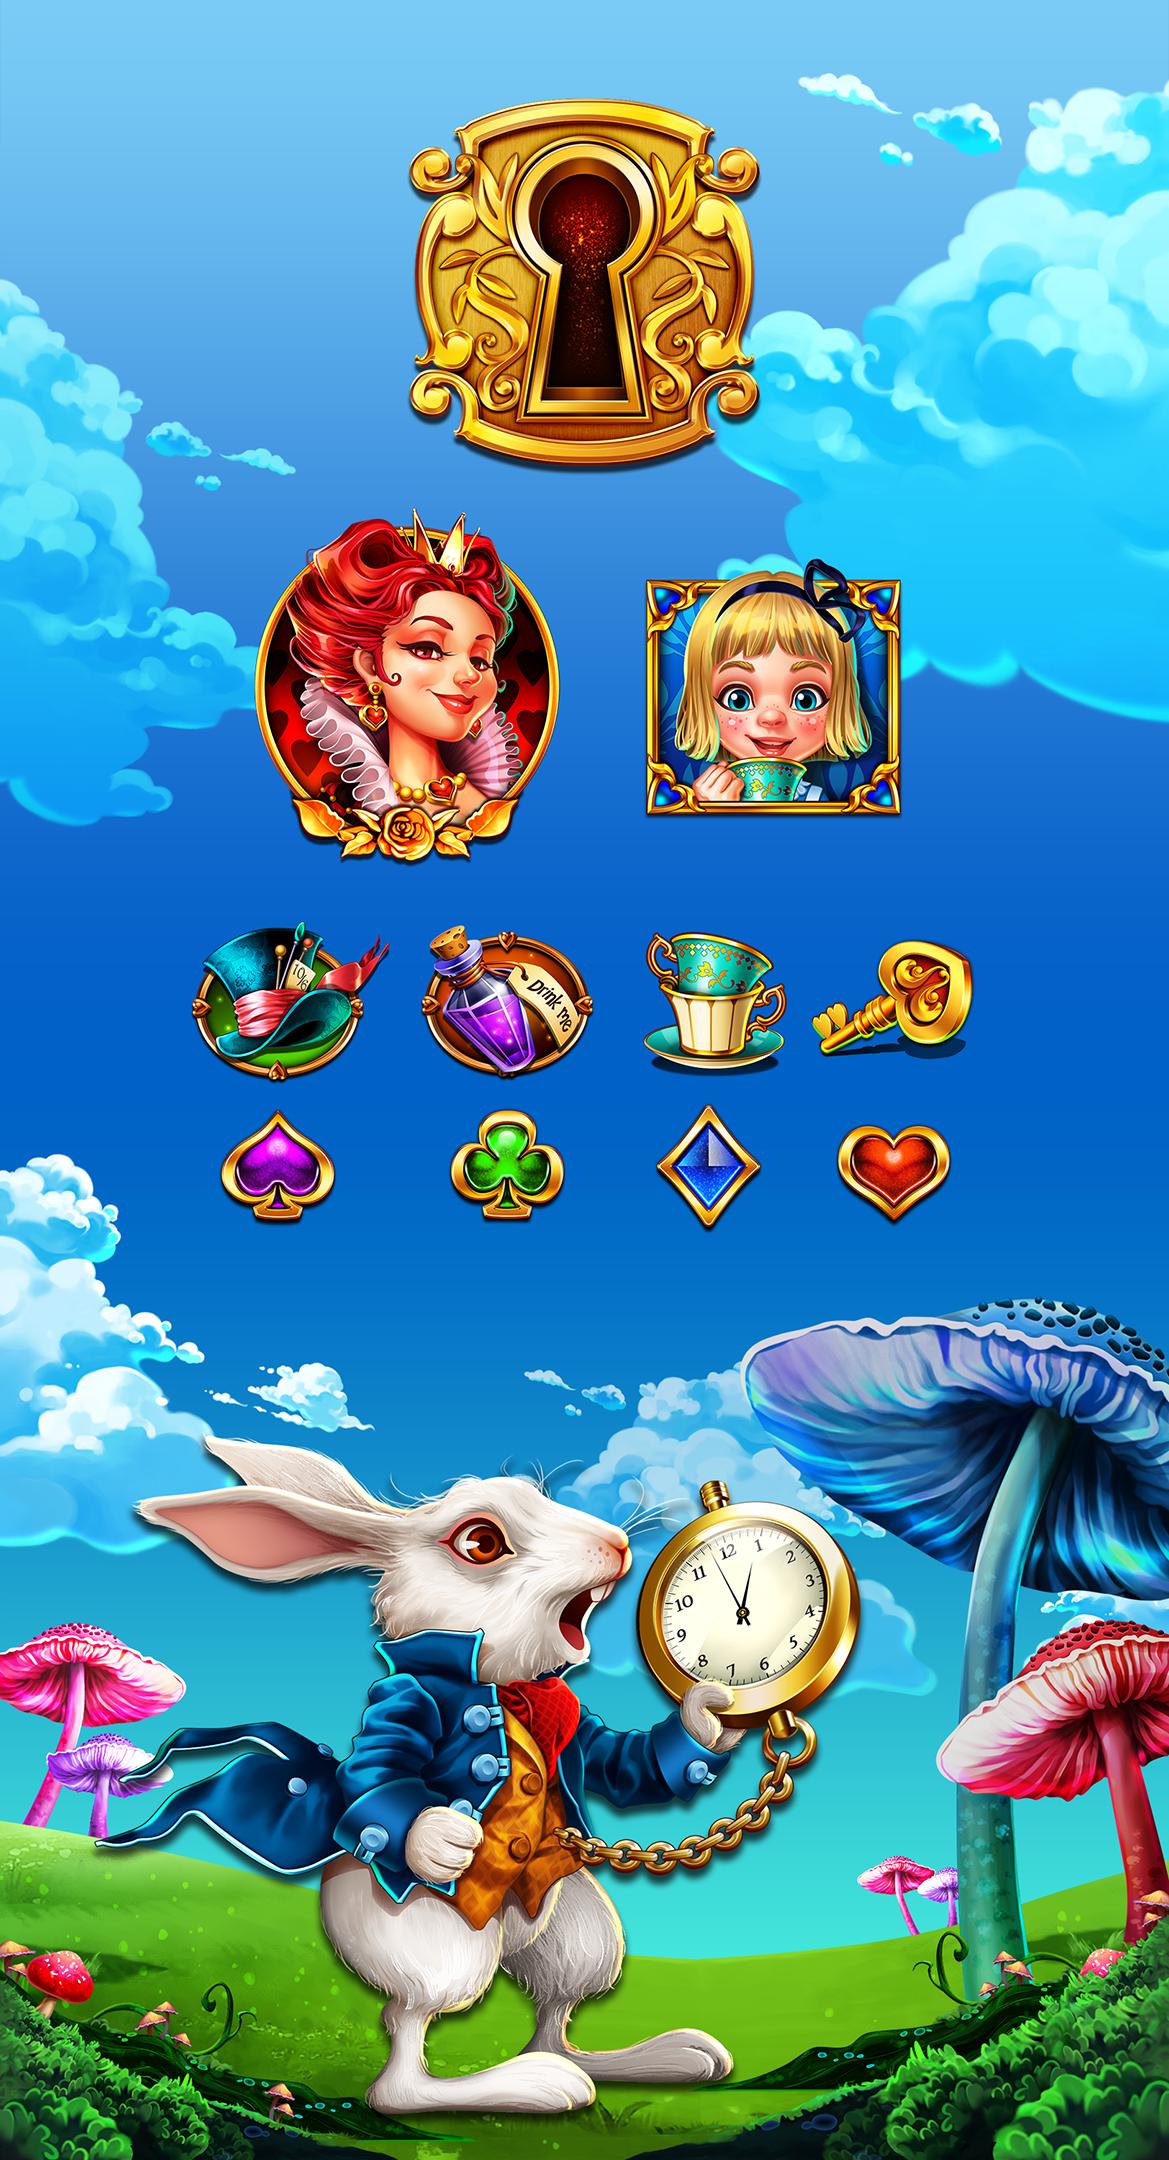 скачать игру queen of hearts